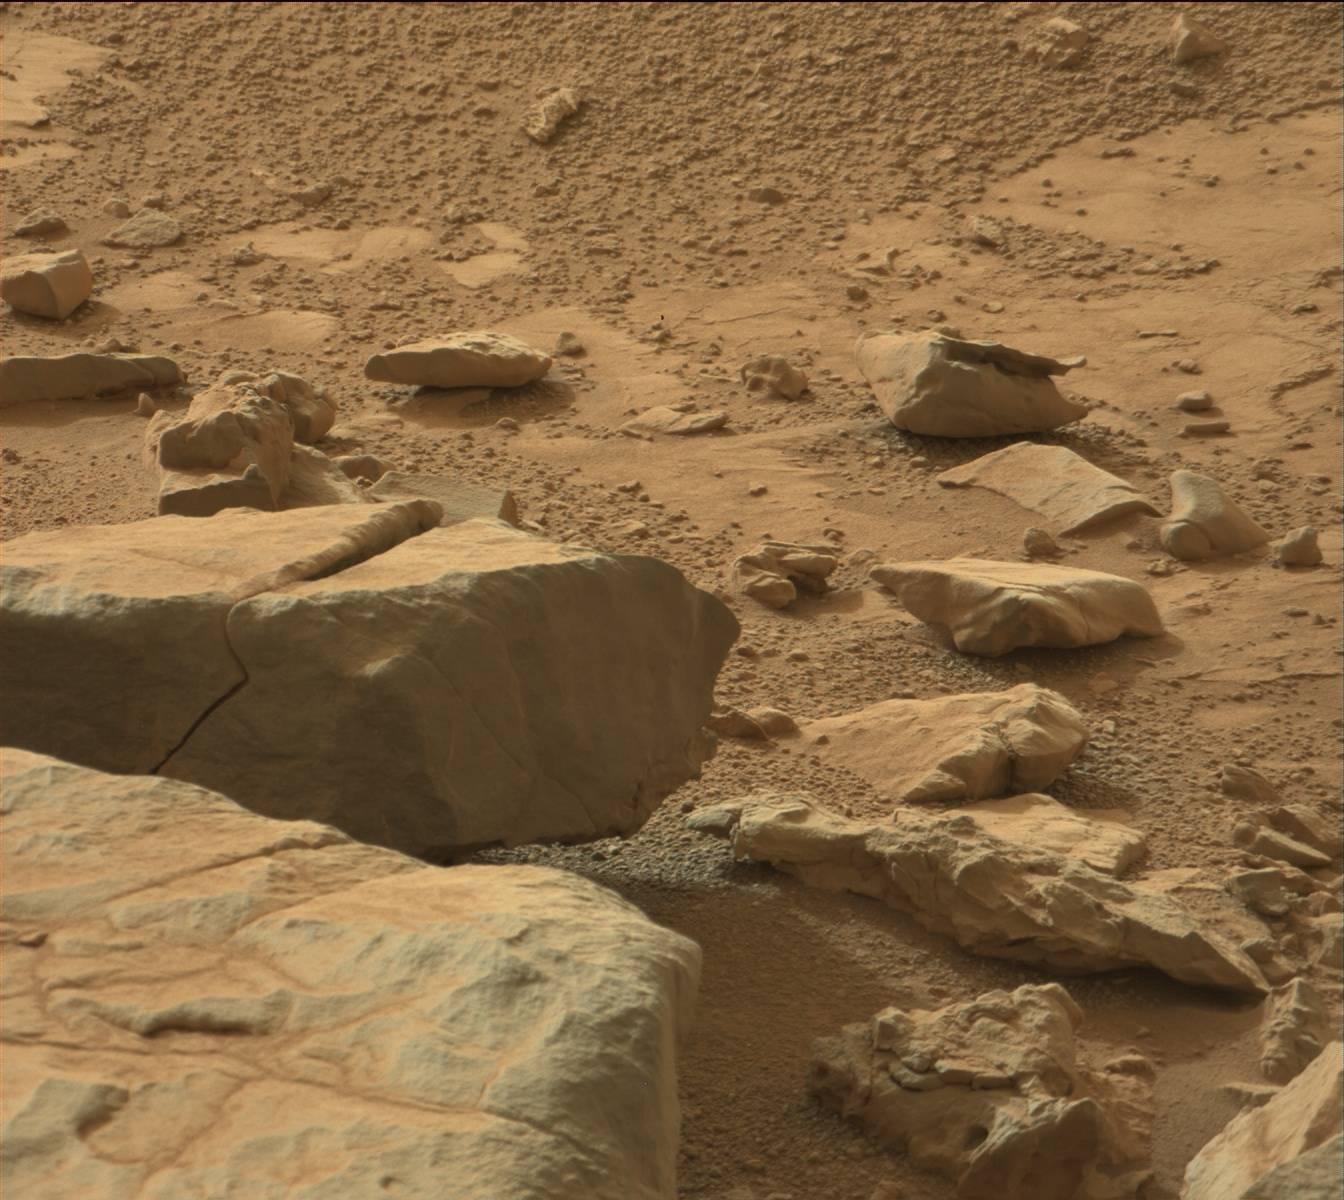 Mars Rover Curiosity Sculpted Anomalies 2013 - YouTube